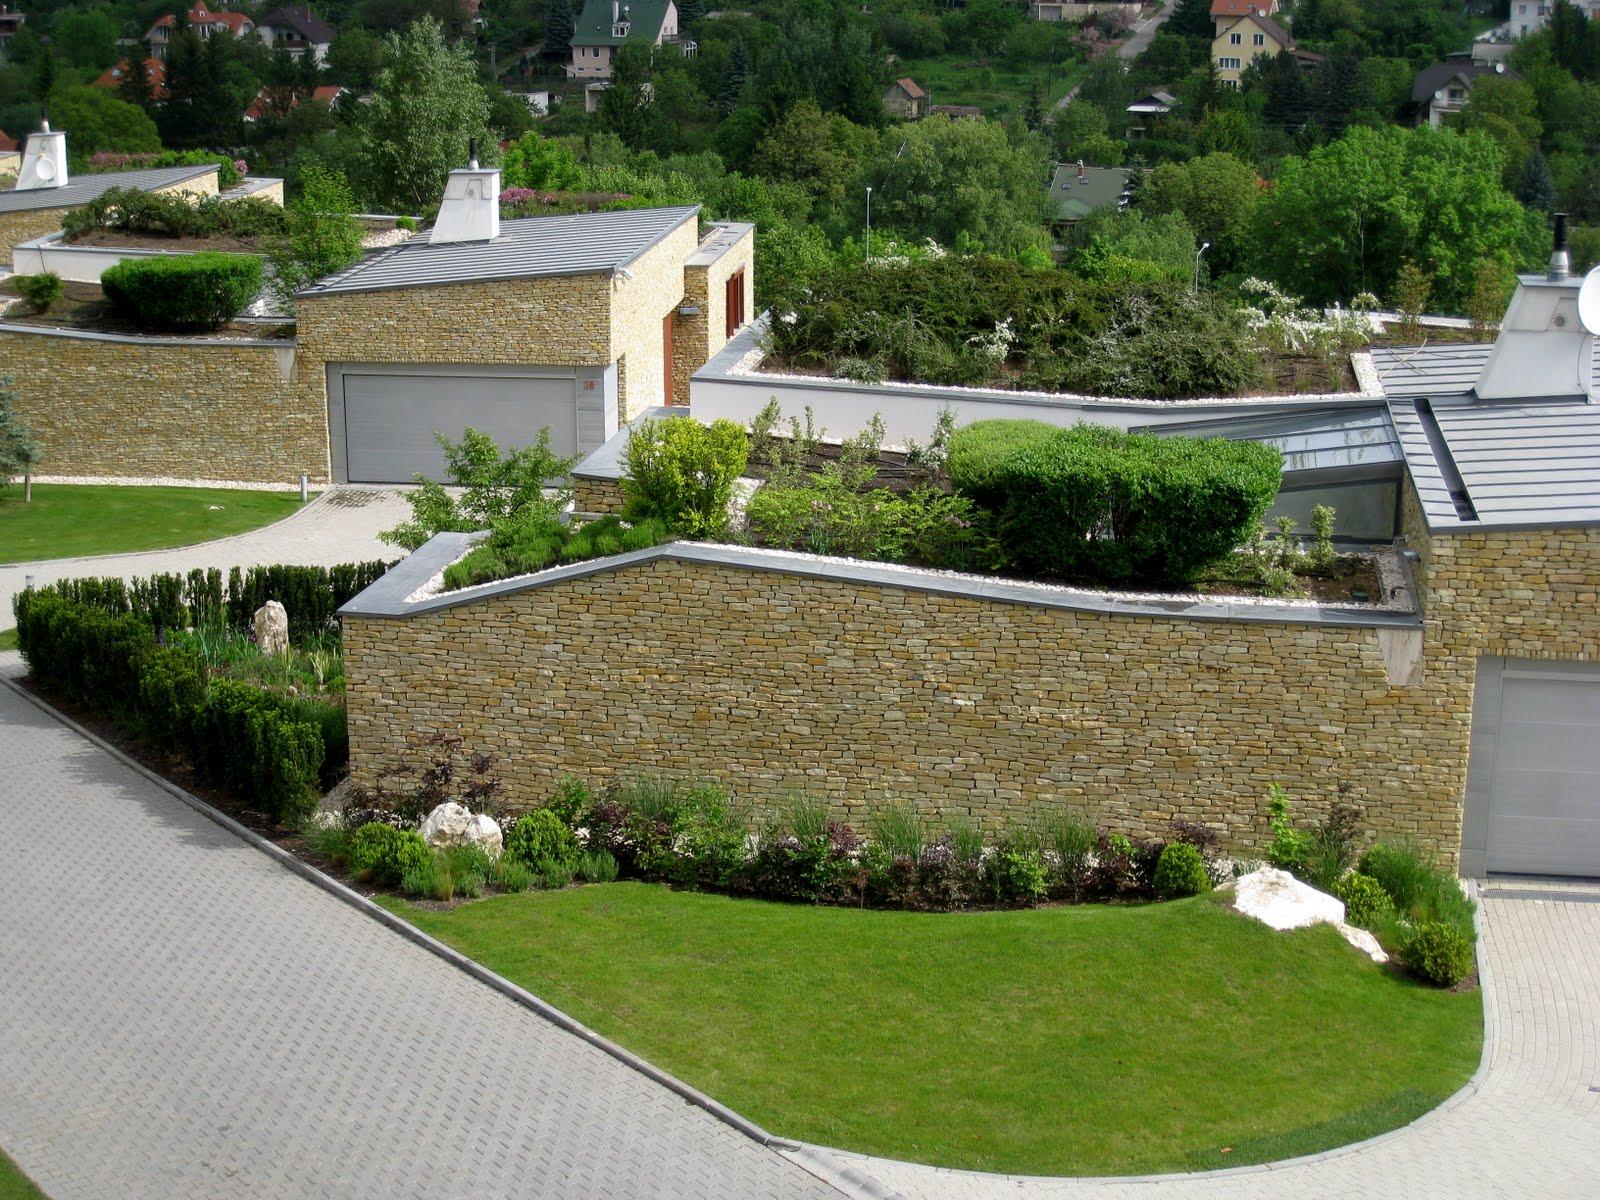 Creative urban roof gardens designs wallpapers hd photo for Urban garden design